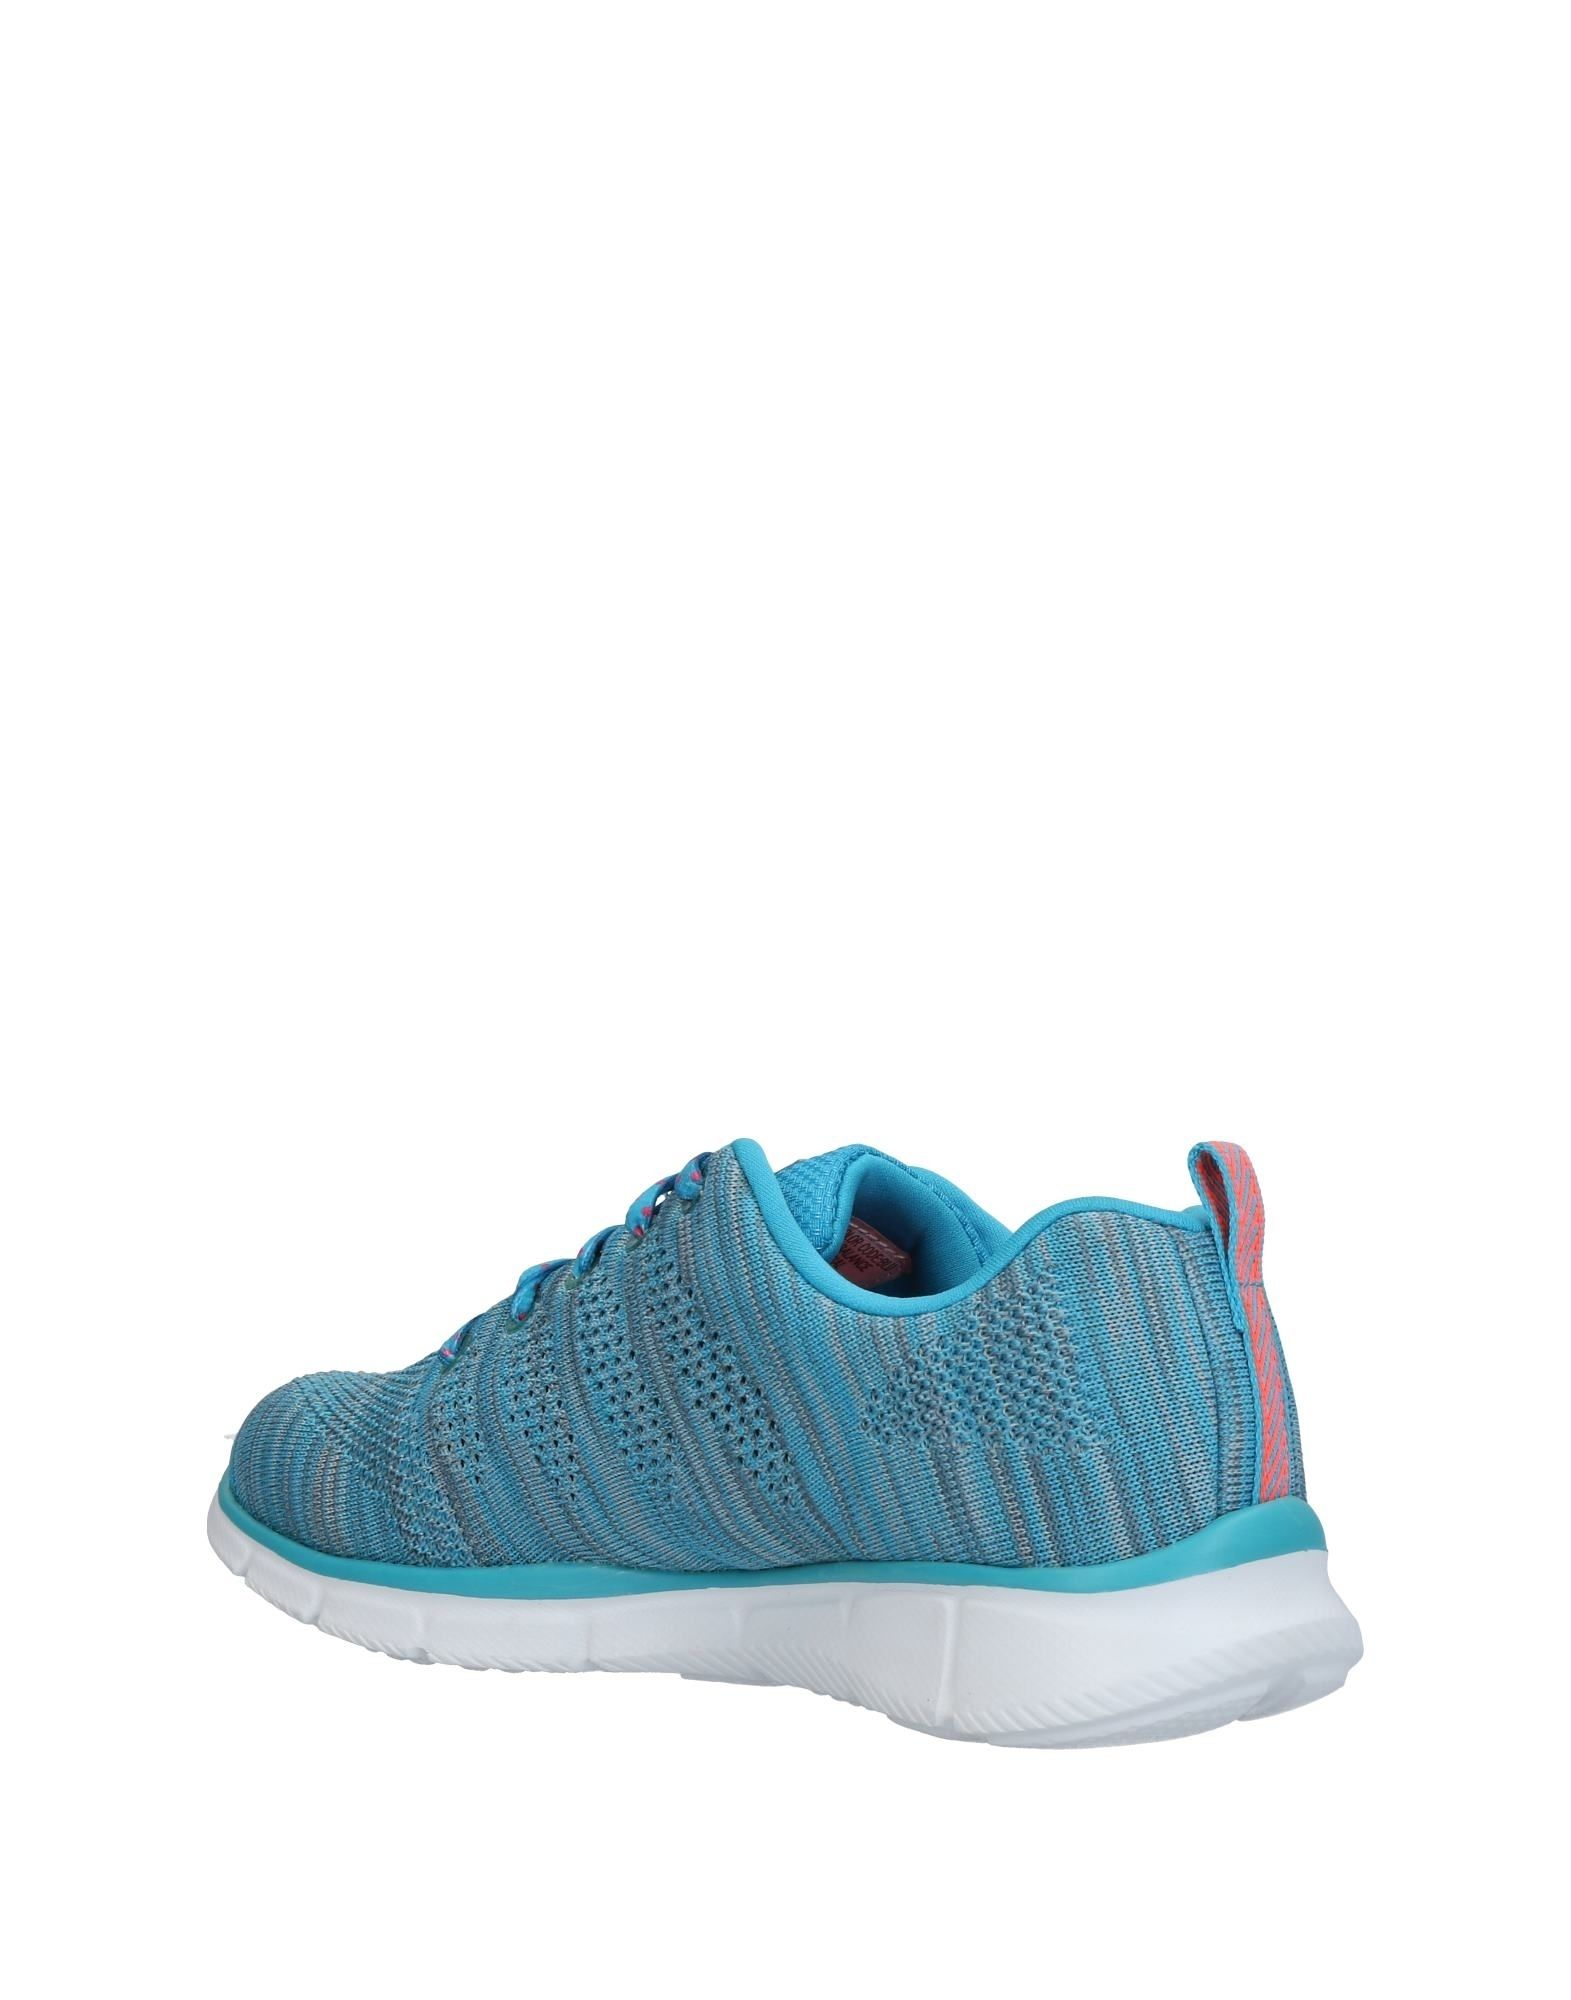 Skechers Sneakers Damen  11464745UX Gute Qualität beliebte beliebte Qualität Schuhe 1fc4cc